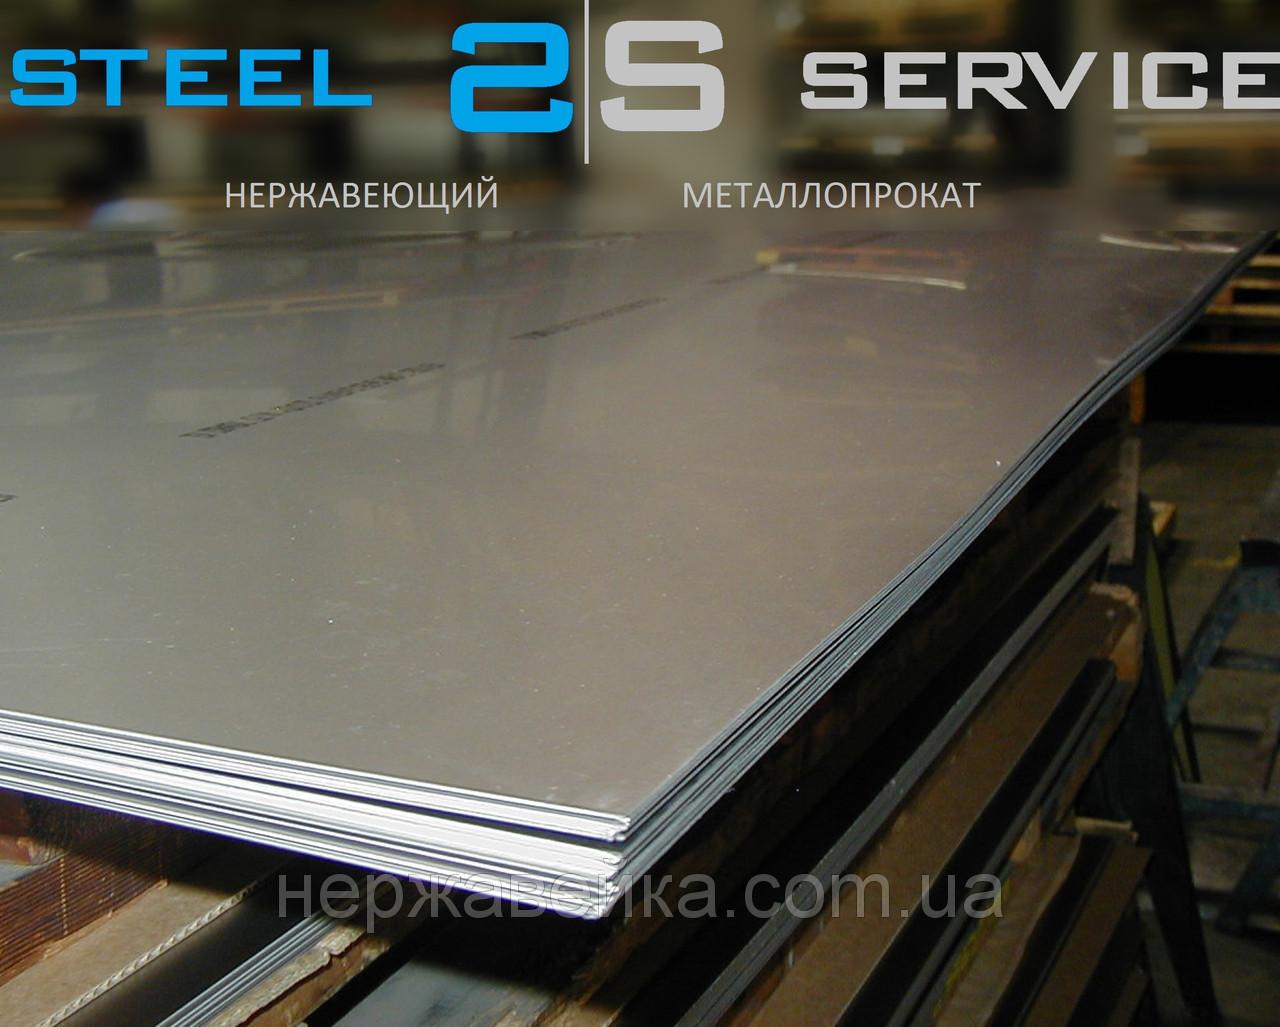 Нержавеющий лист 1х1250х2500мм  AISI 316Ti(10Х17Н13М2Т) 4N - шлифованный,  кислотостойкий